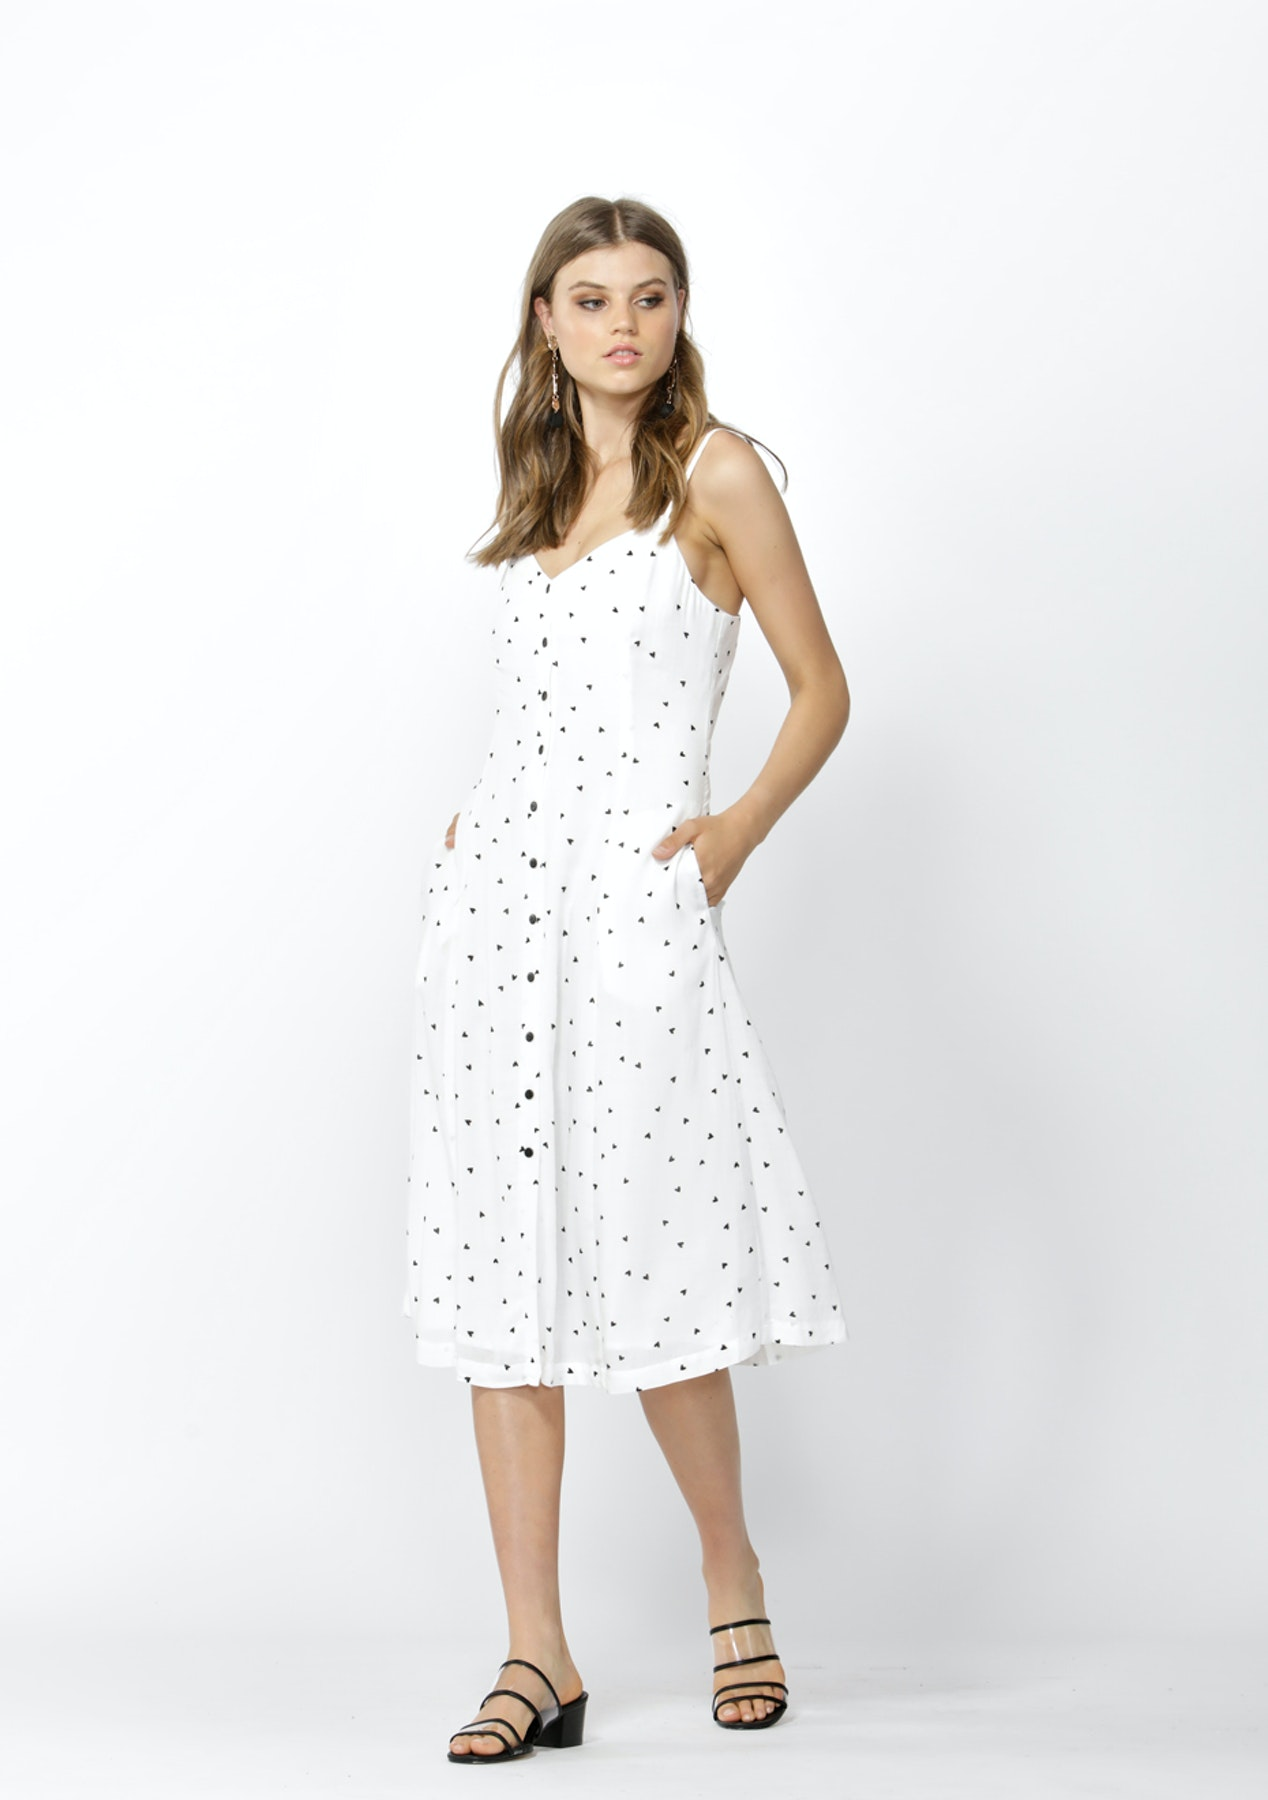 da0f04002be51 Sass - Floating Hearts Slip Dress - Floating Hearts Print